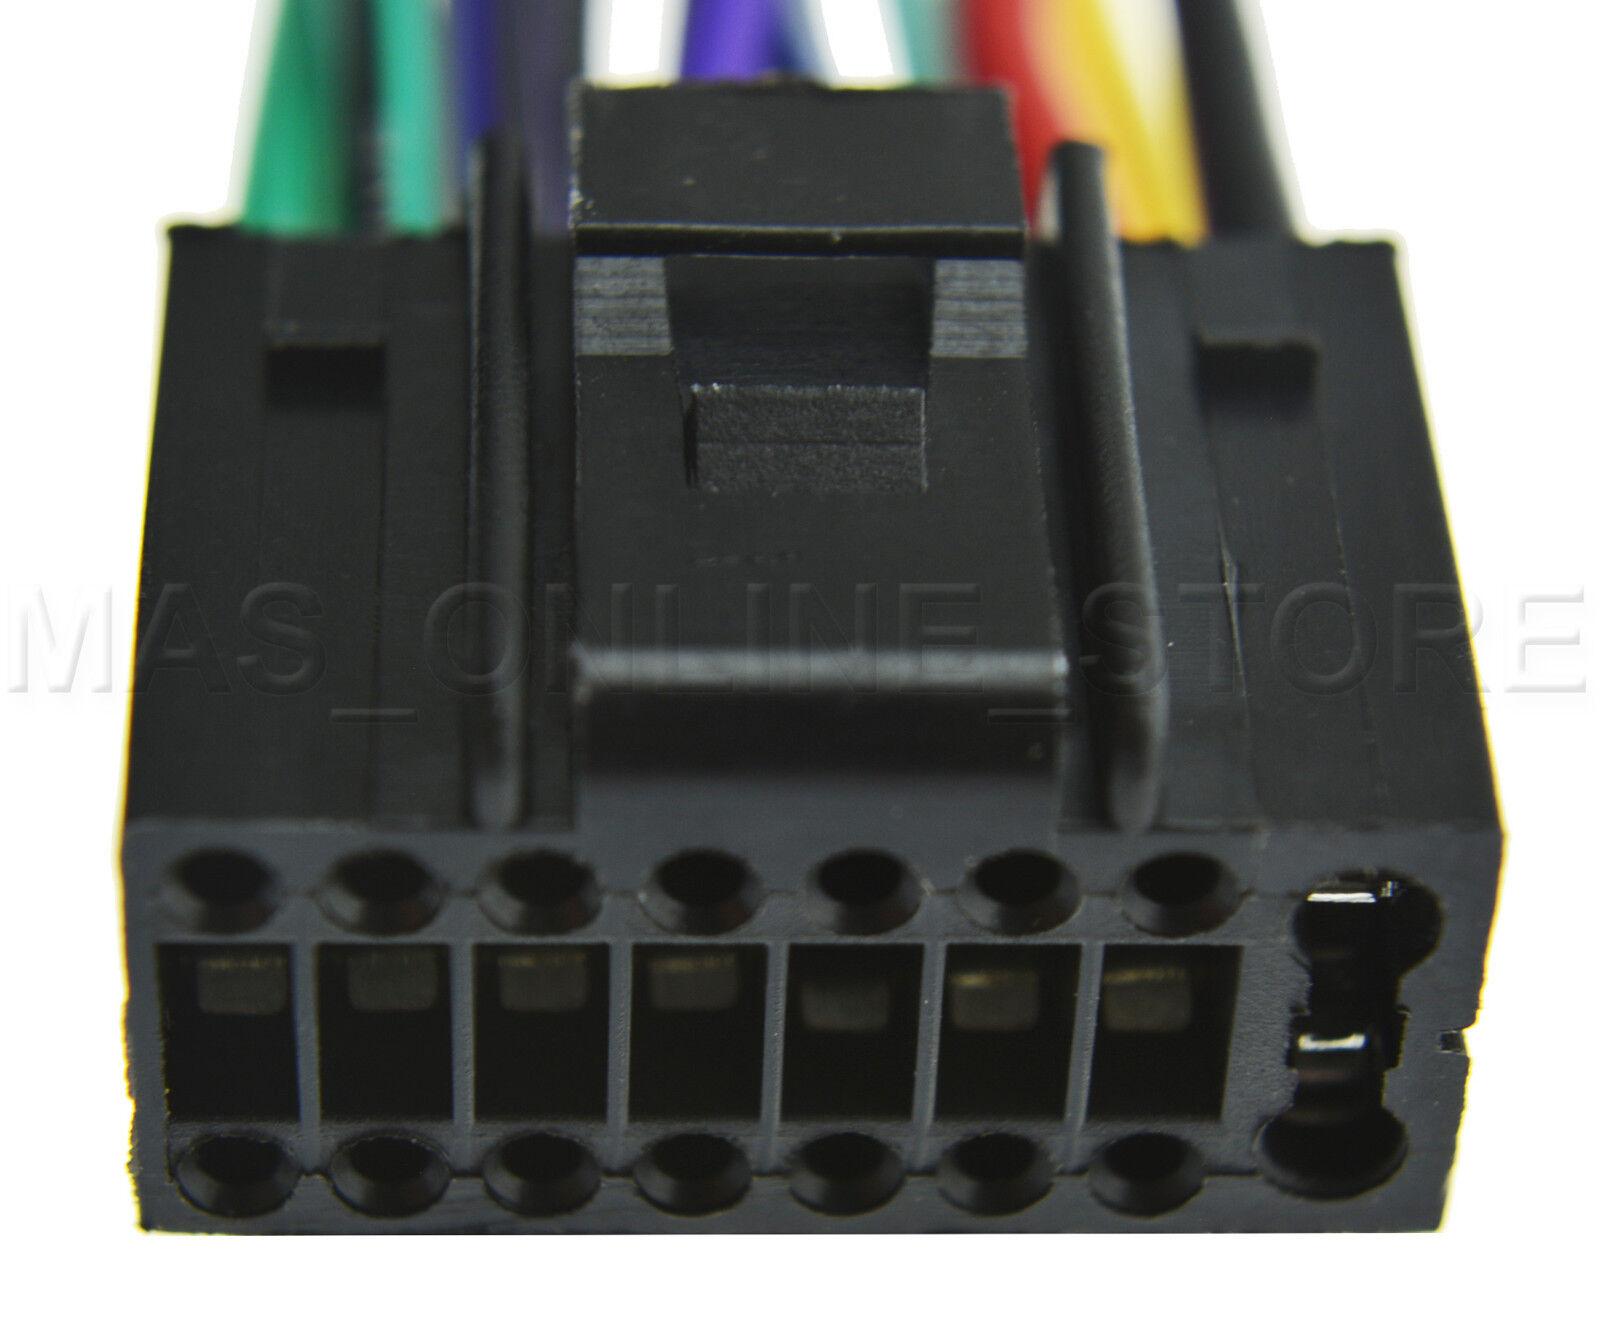 Car Stereo Wiring Diagram Jvc Kw Adv794 - Wiring Diagram •